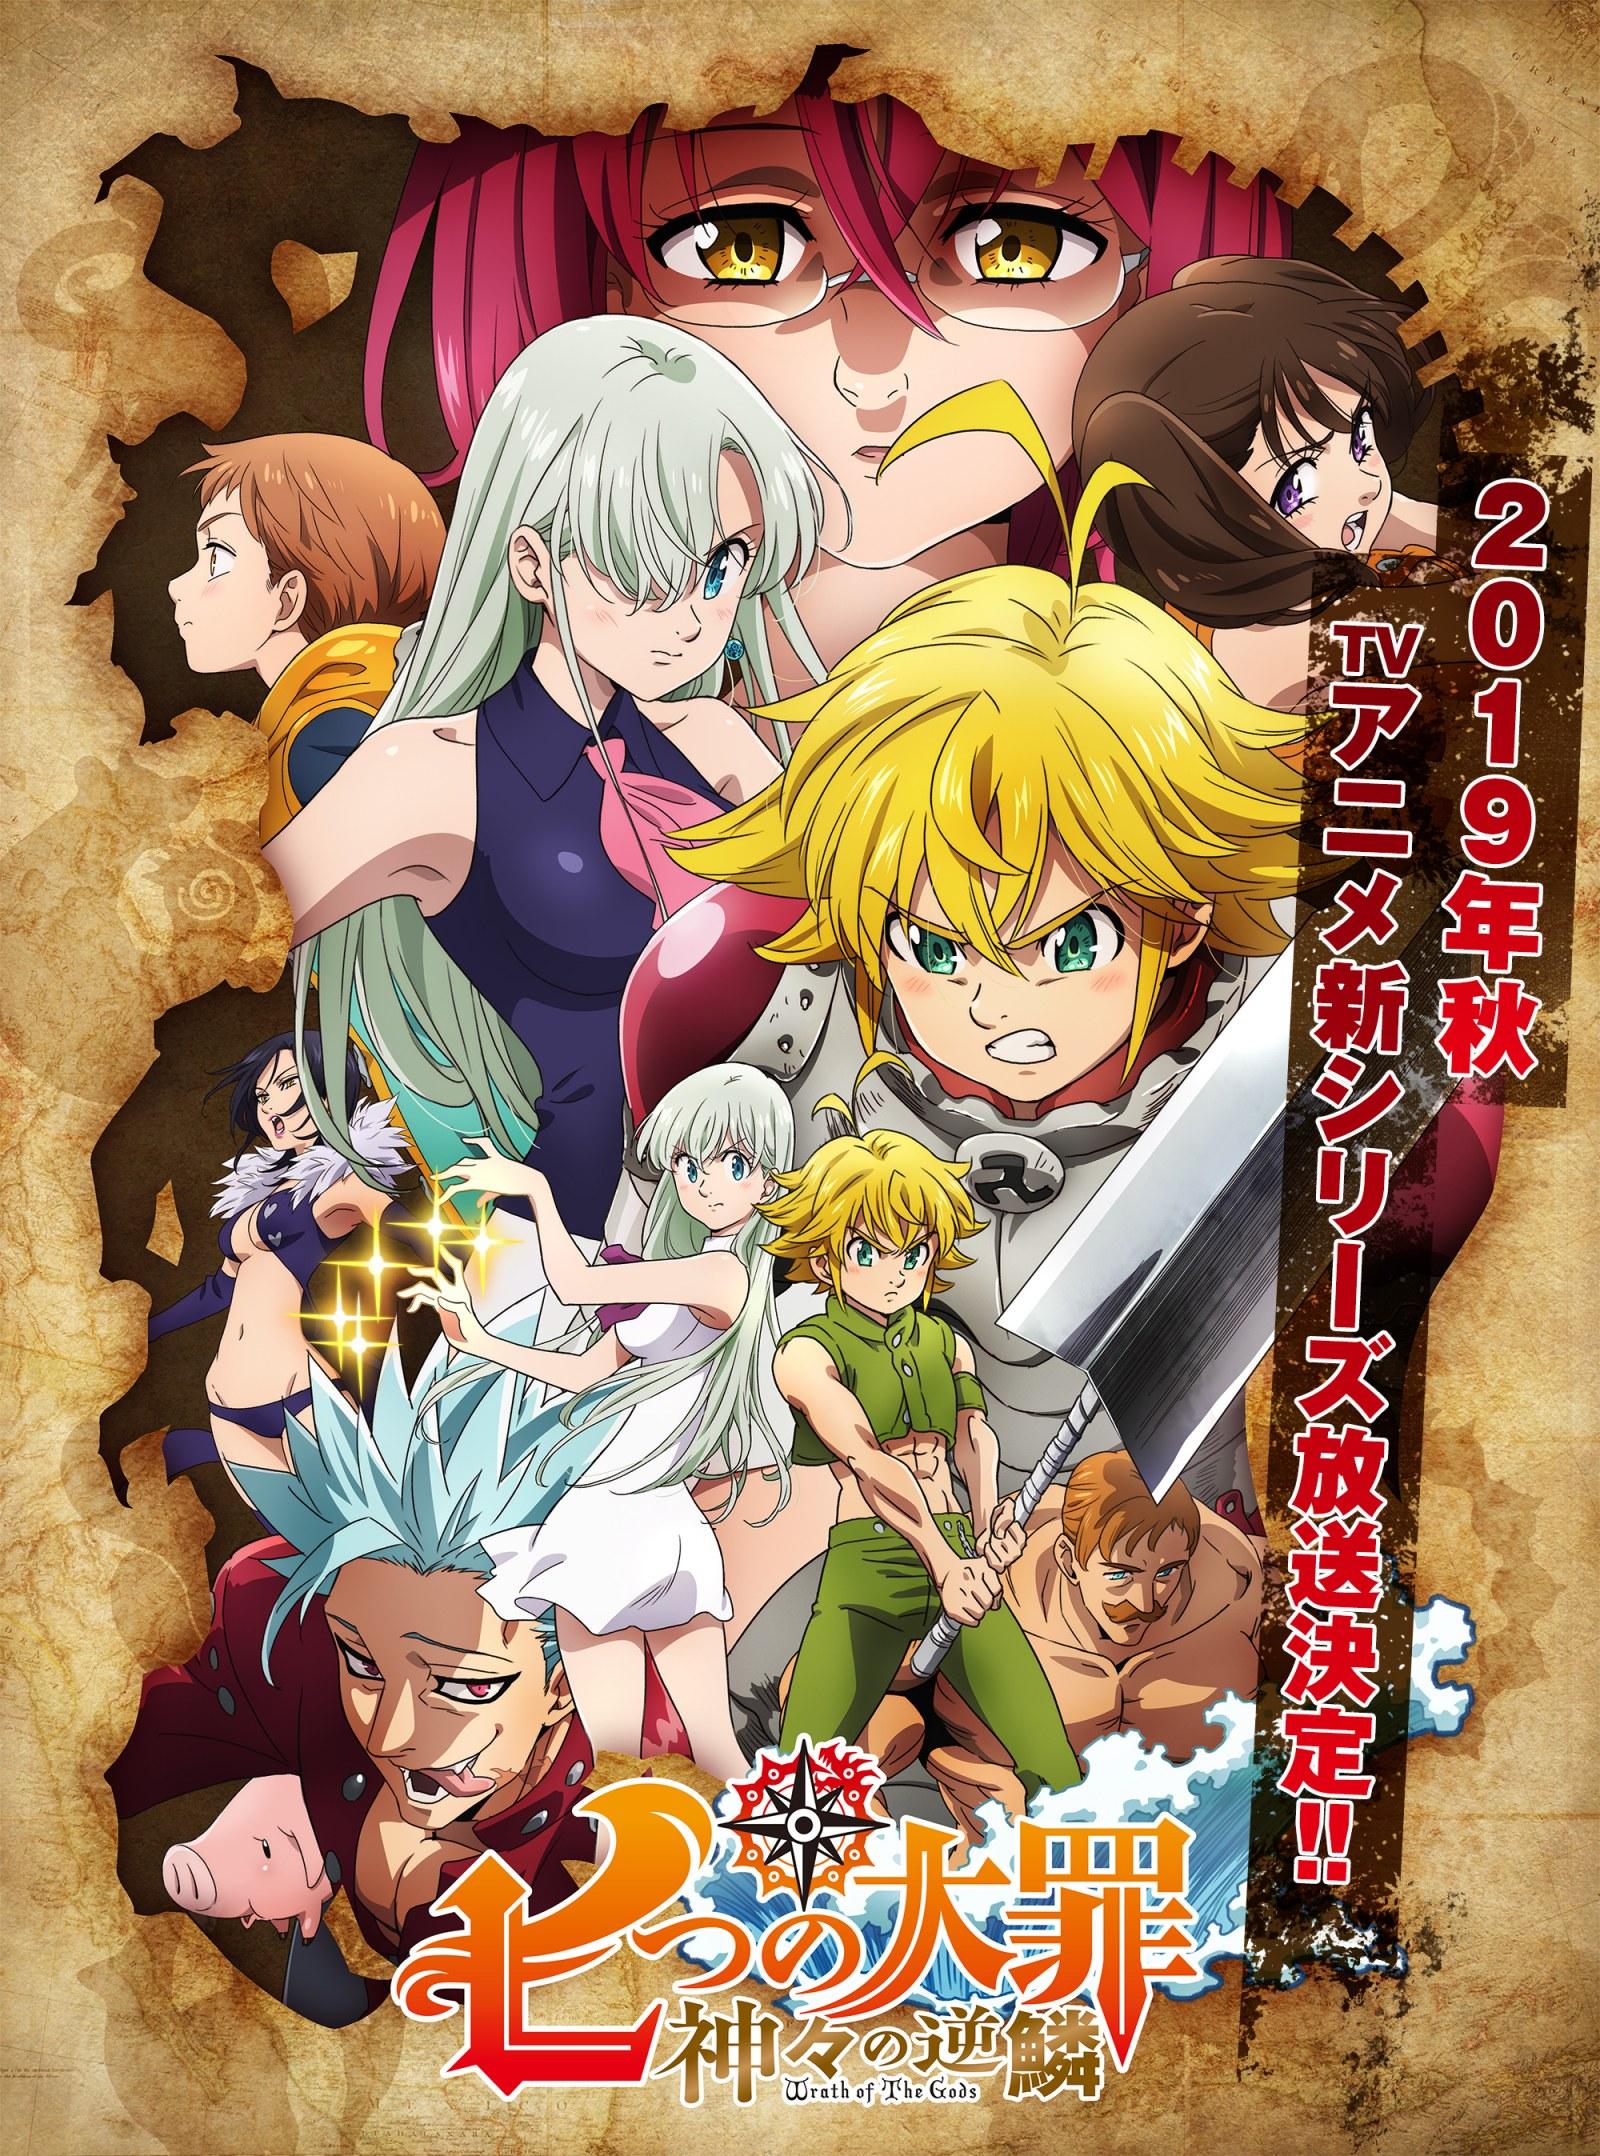 Seven Deadly Sins S3